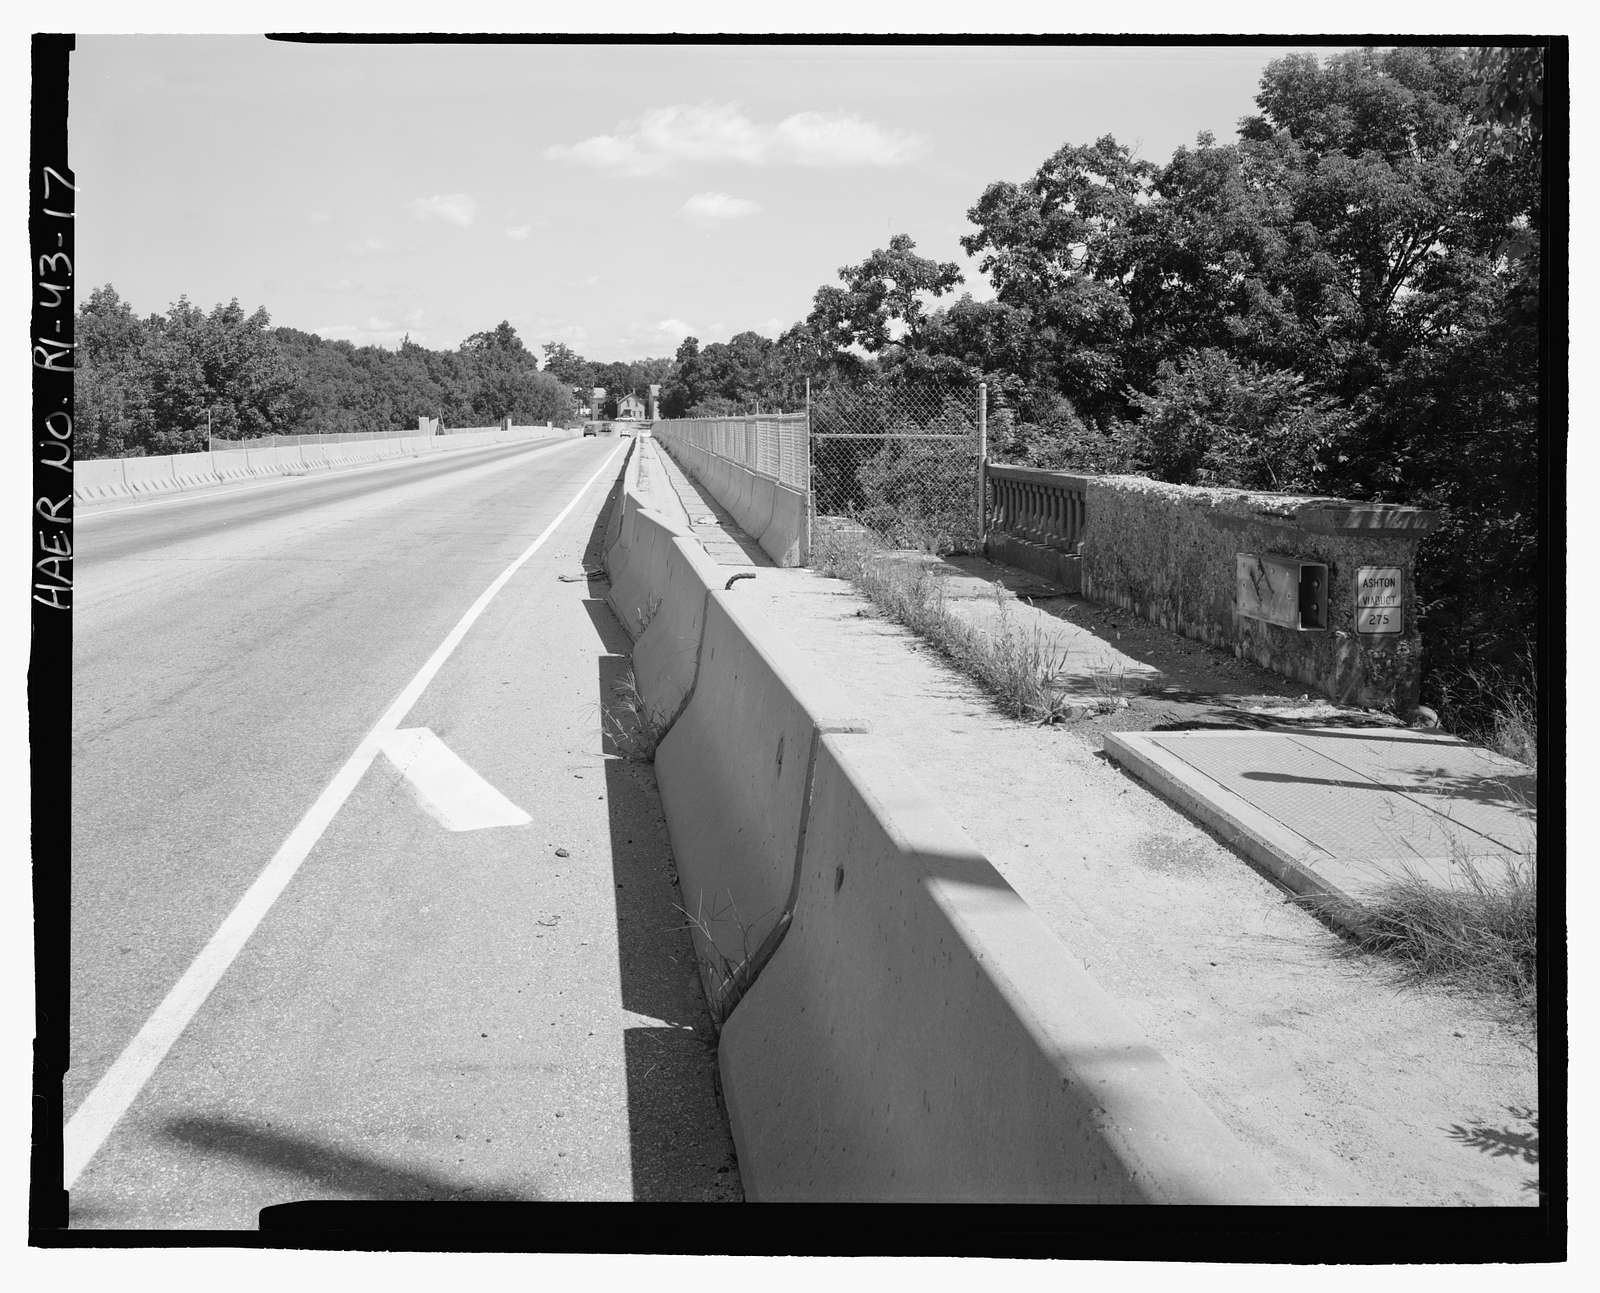 Ashton Viaduct, State Route 116 (Washington Highway) spanning Blackstone River, Blackstone Canal, & Providence & Worcester Railroad, Ashton, Providence County, RI